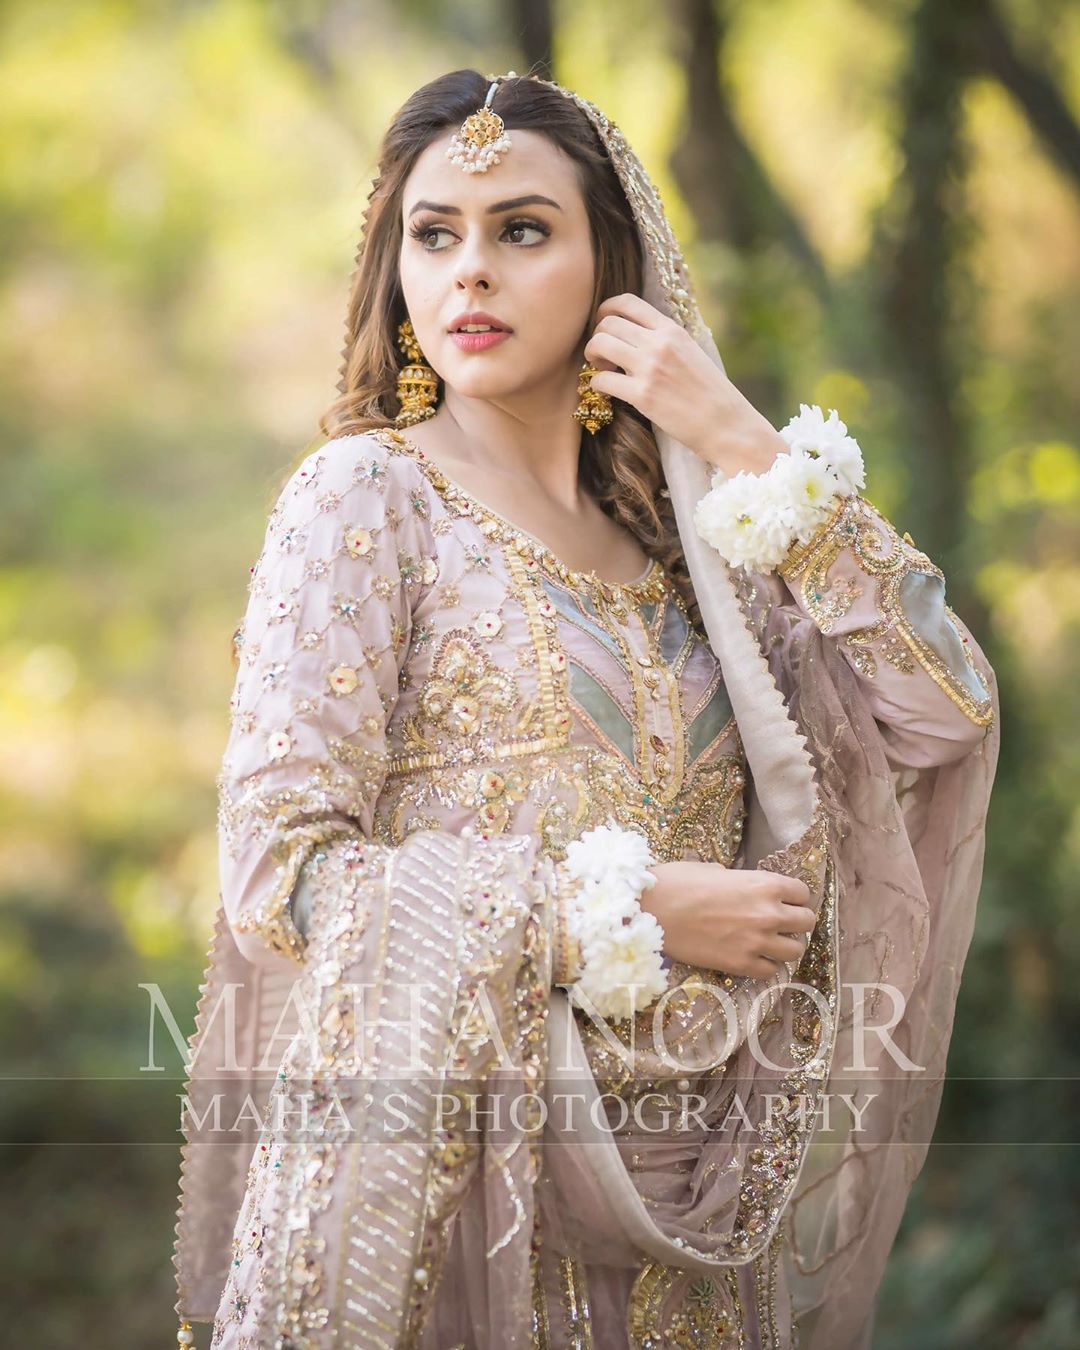 Waliya Najib, Famous Pakistani Photographer and Model, Gets Nikkafied